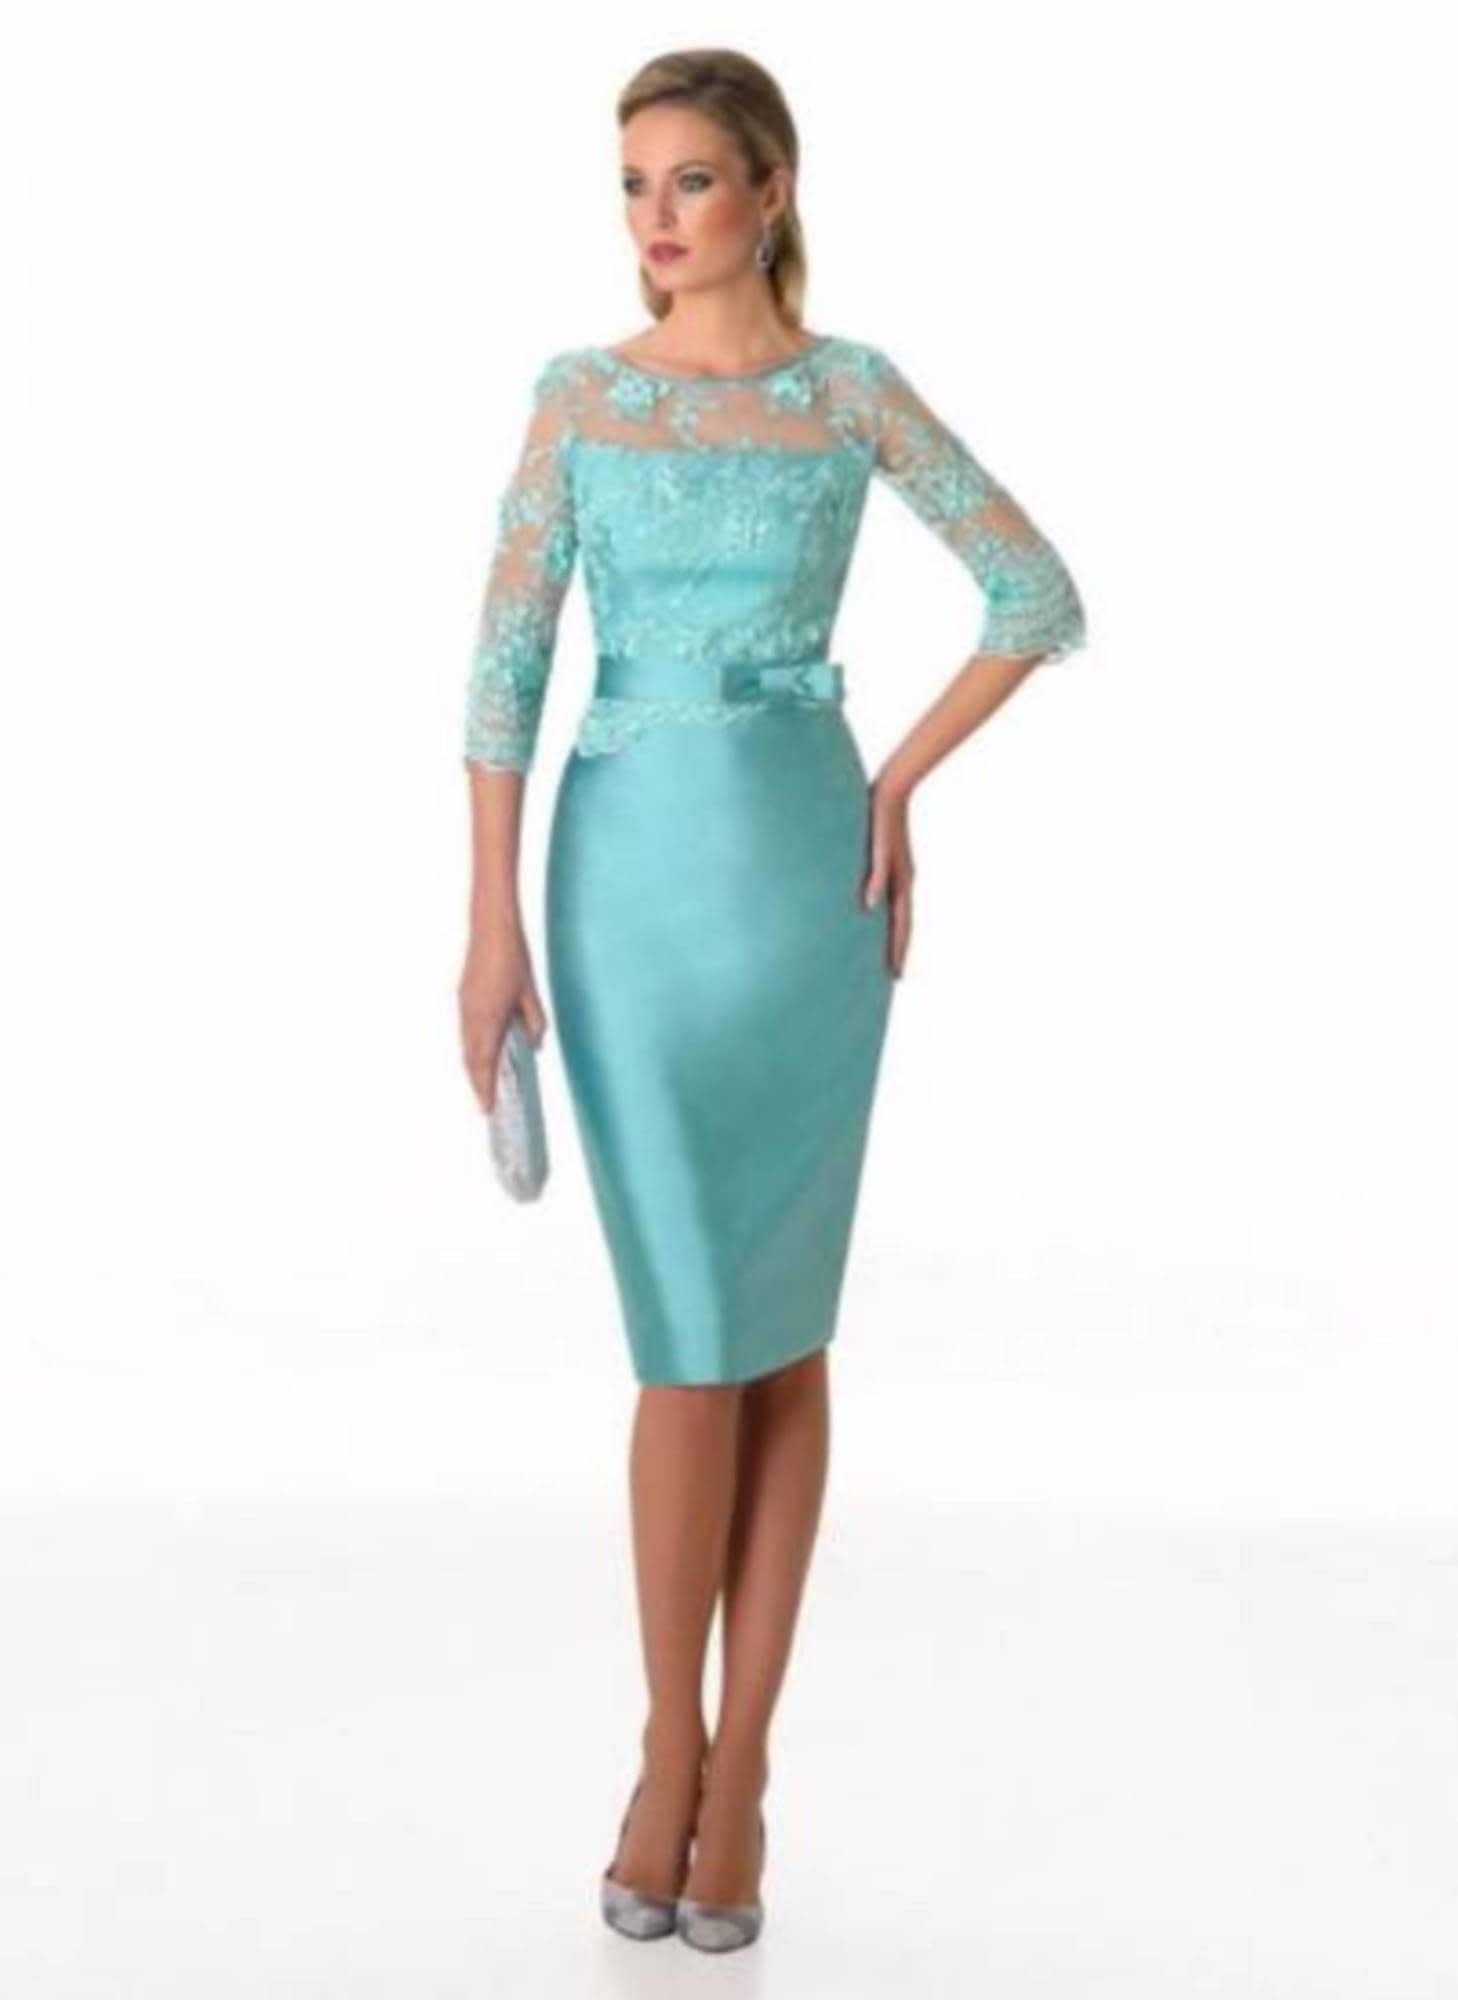 GALERIA | Modas Almudever